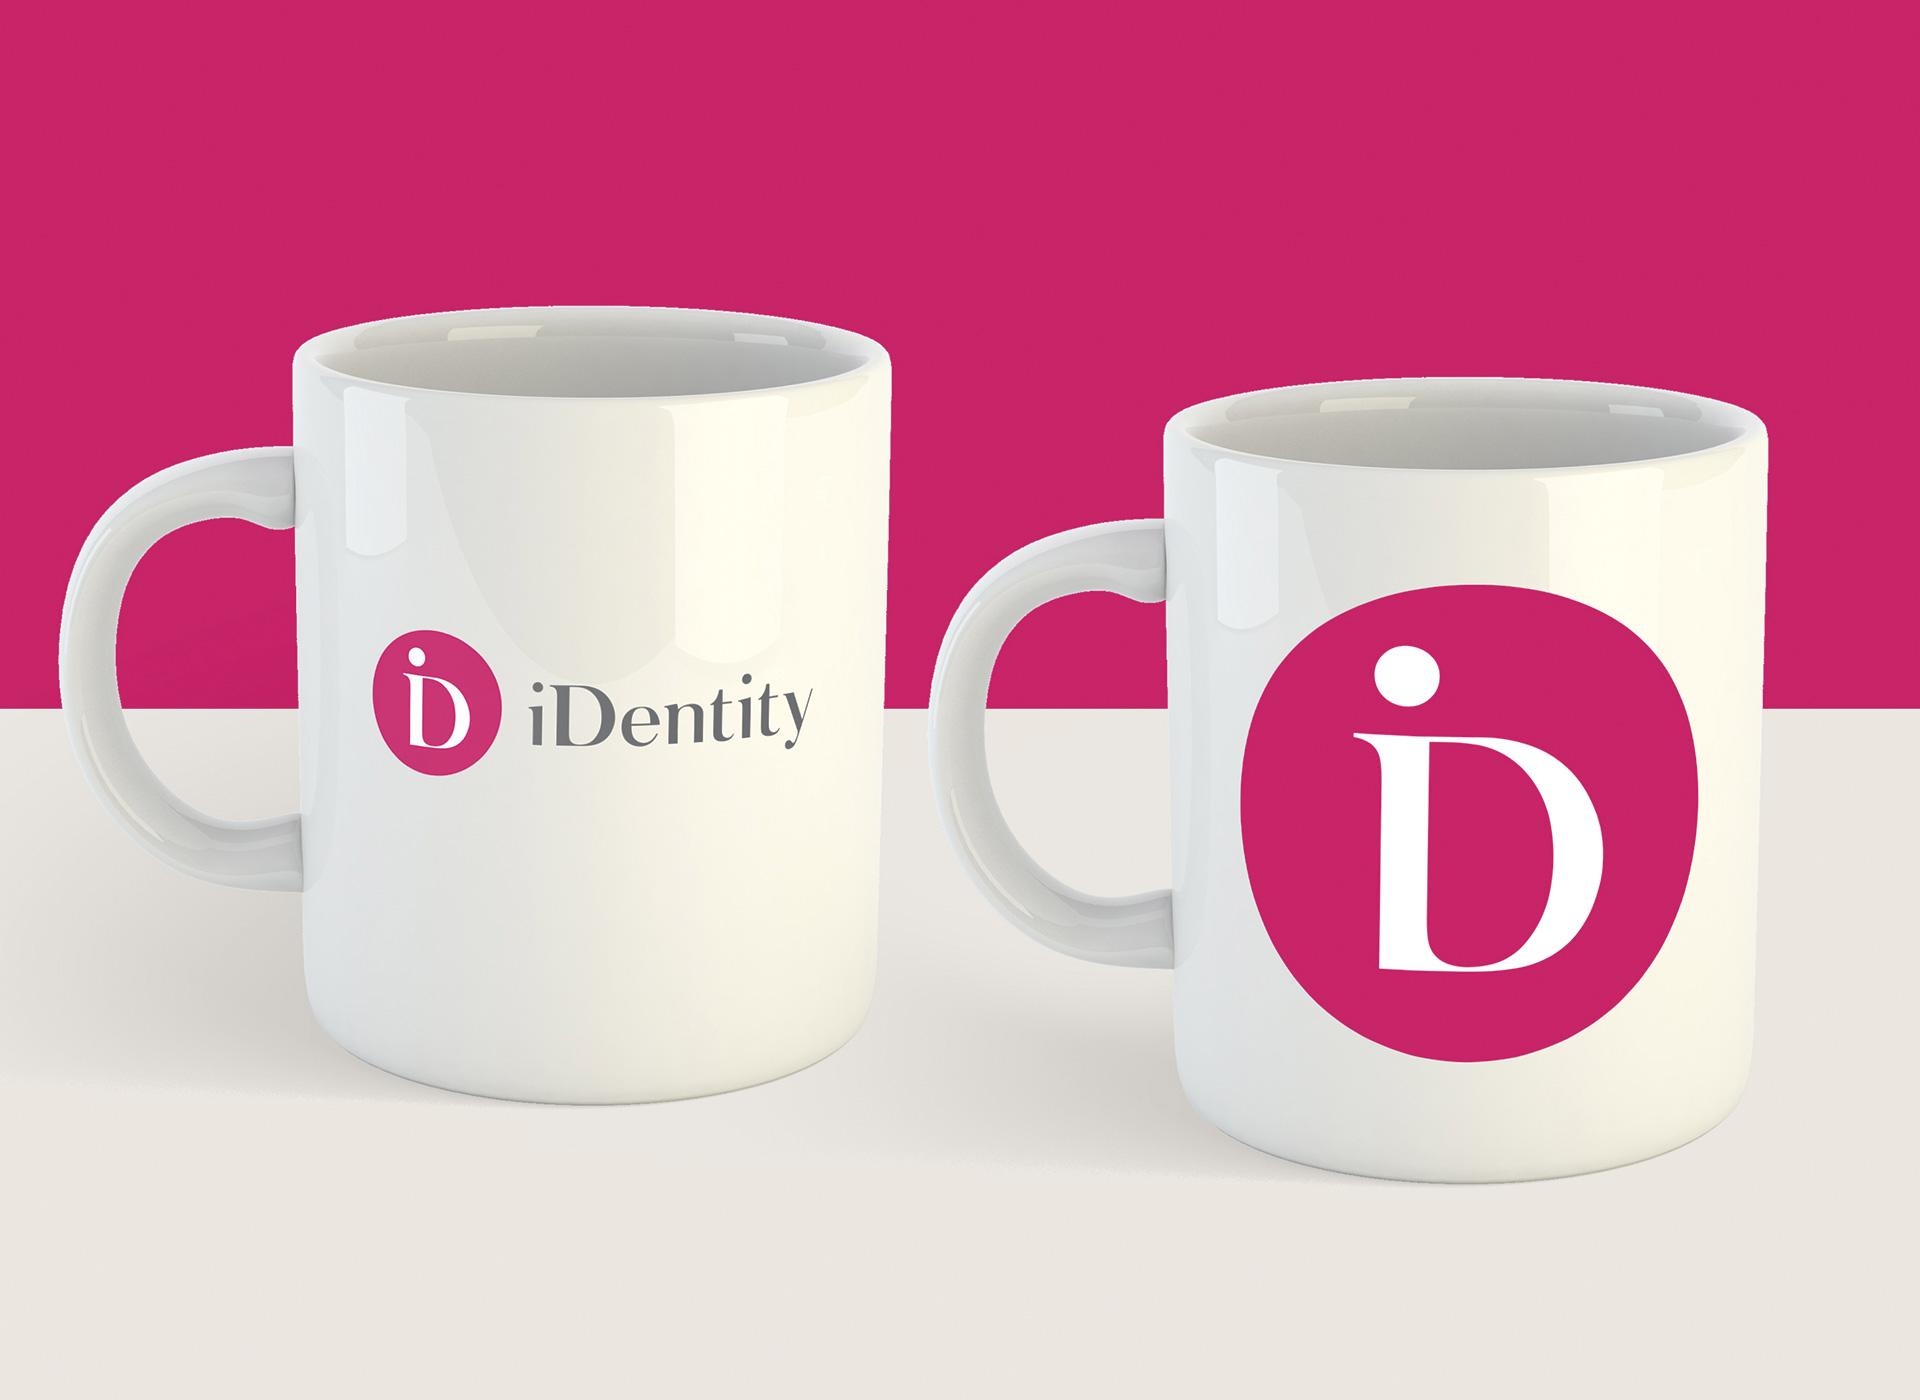 identity logo applied after rebranding